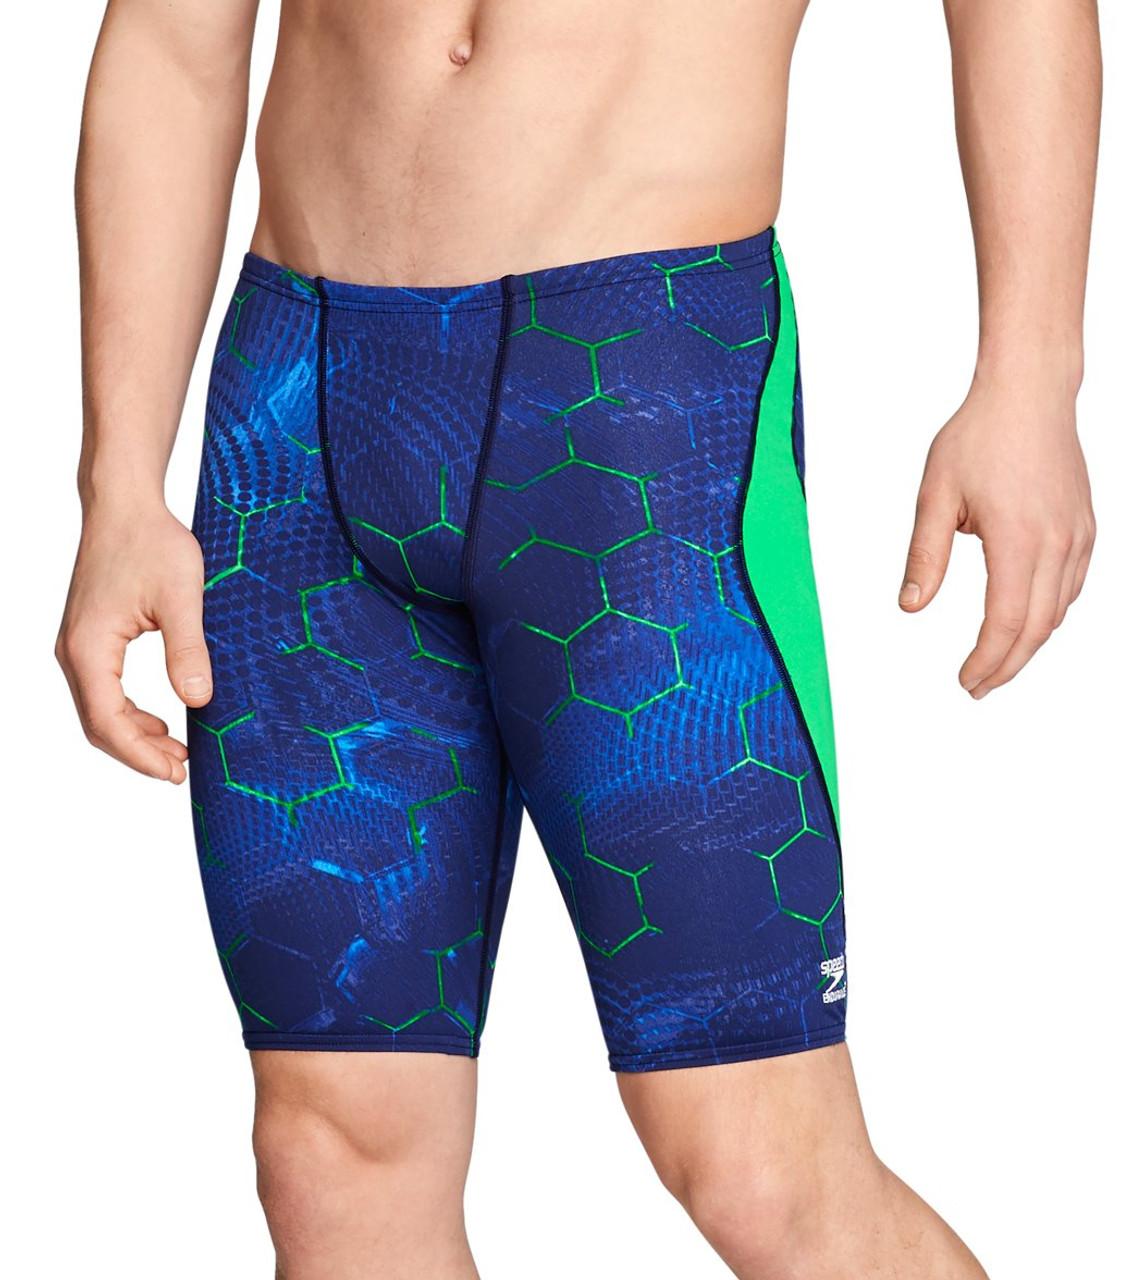 Speedo Mens Swimsuit Jammer Endurance The Fast Way